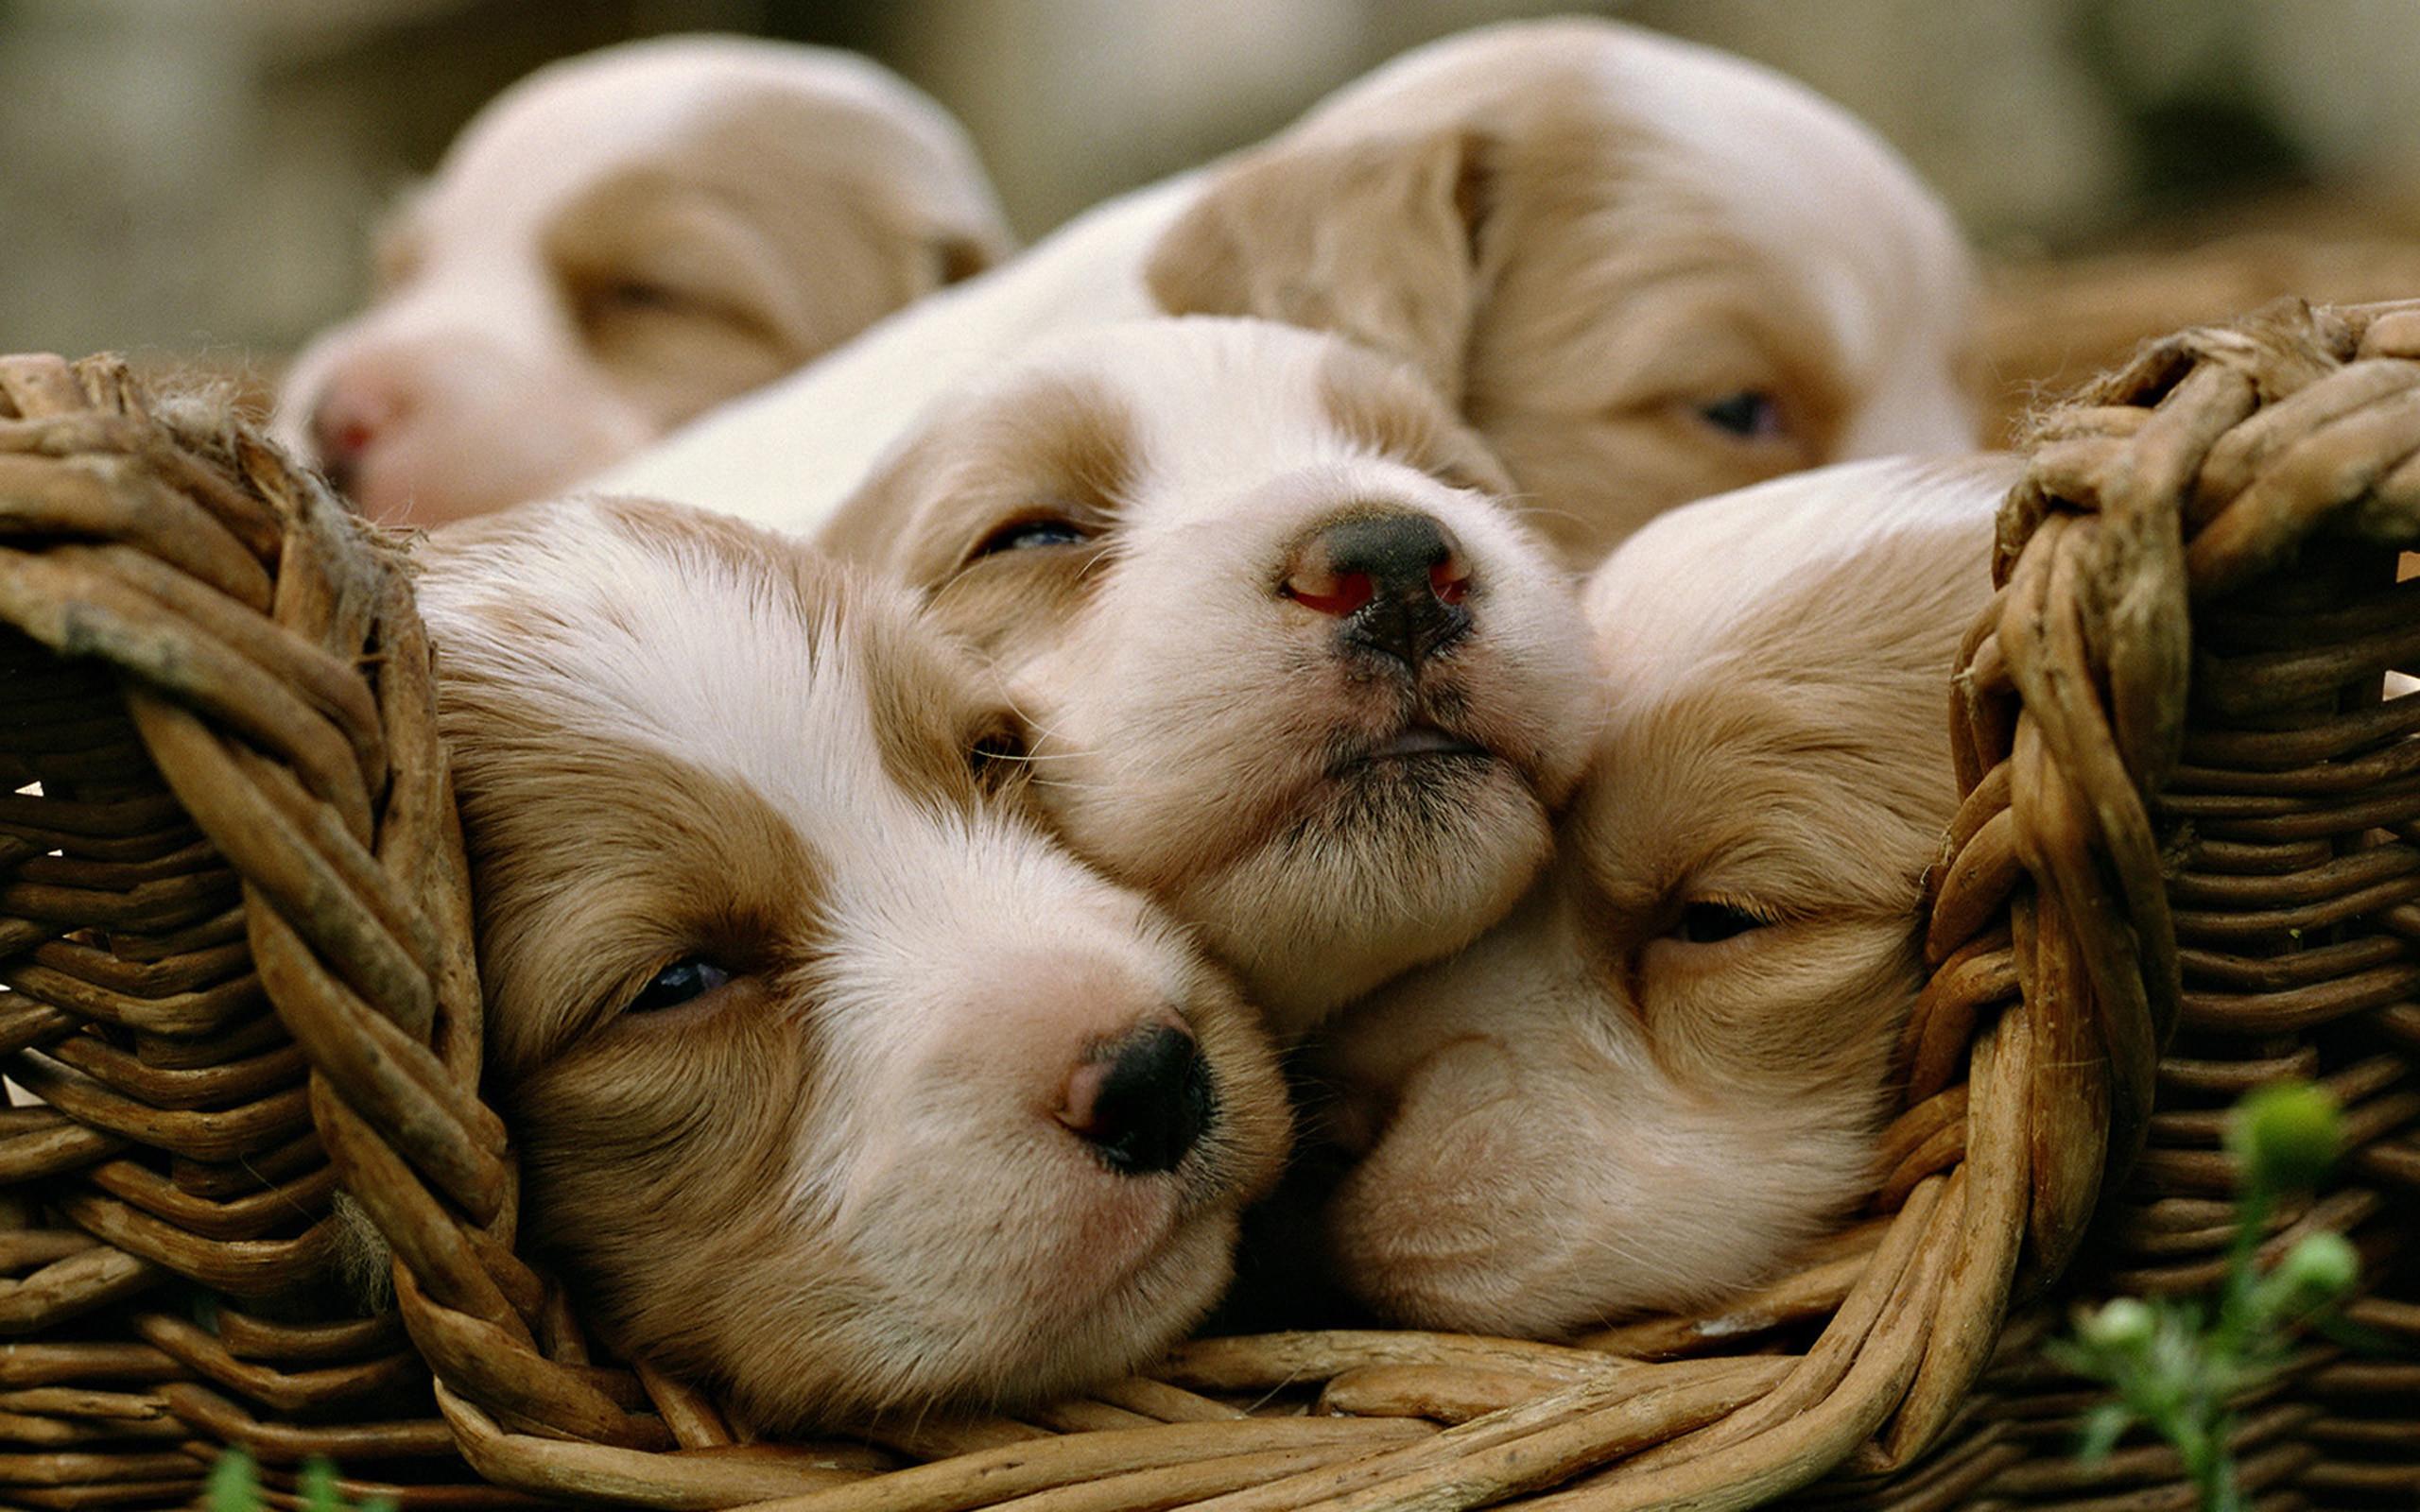 Labrador Puppies wallpaper – free wallpapers, download wallpaper .